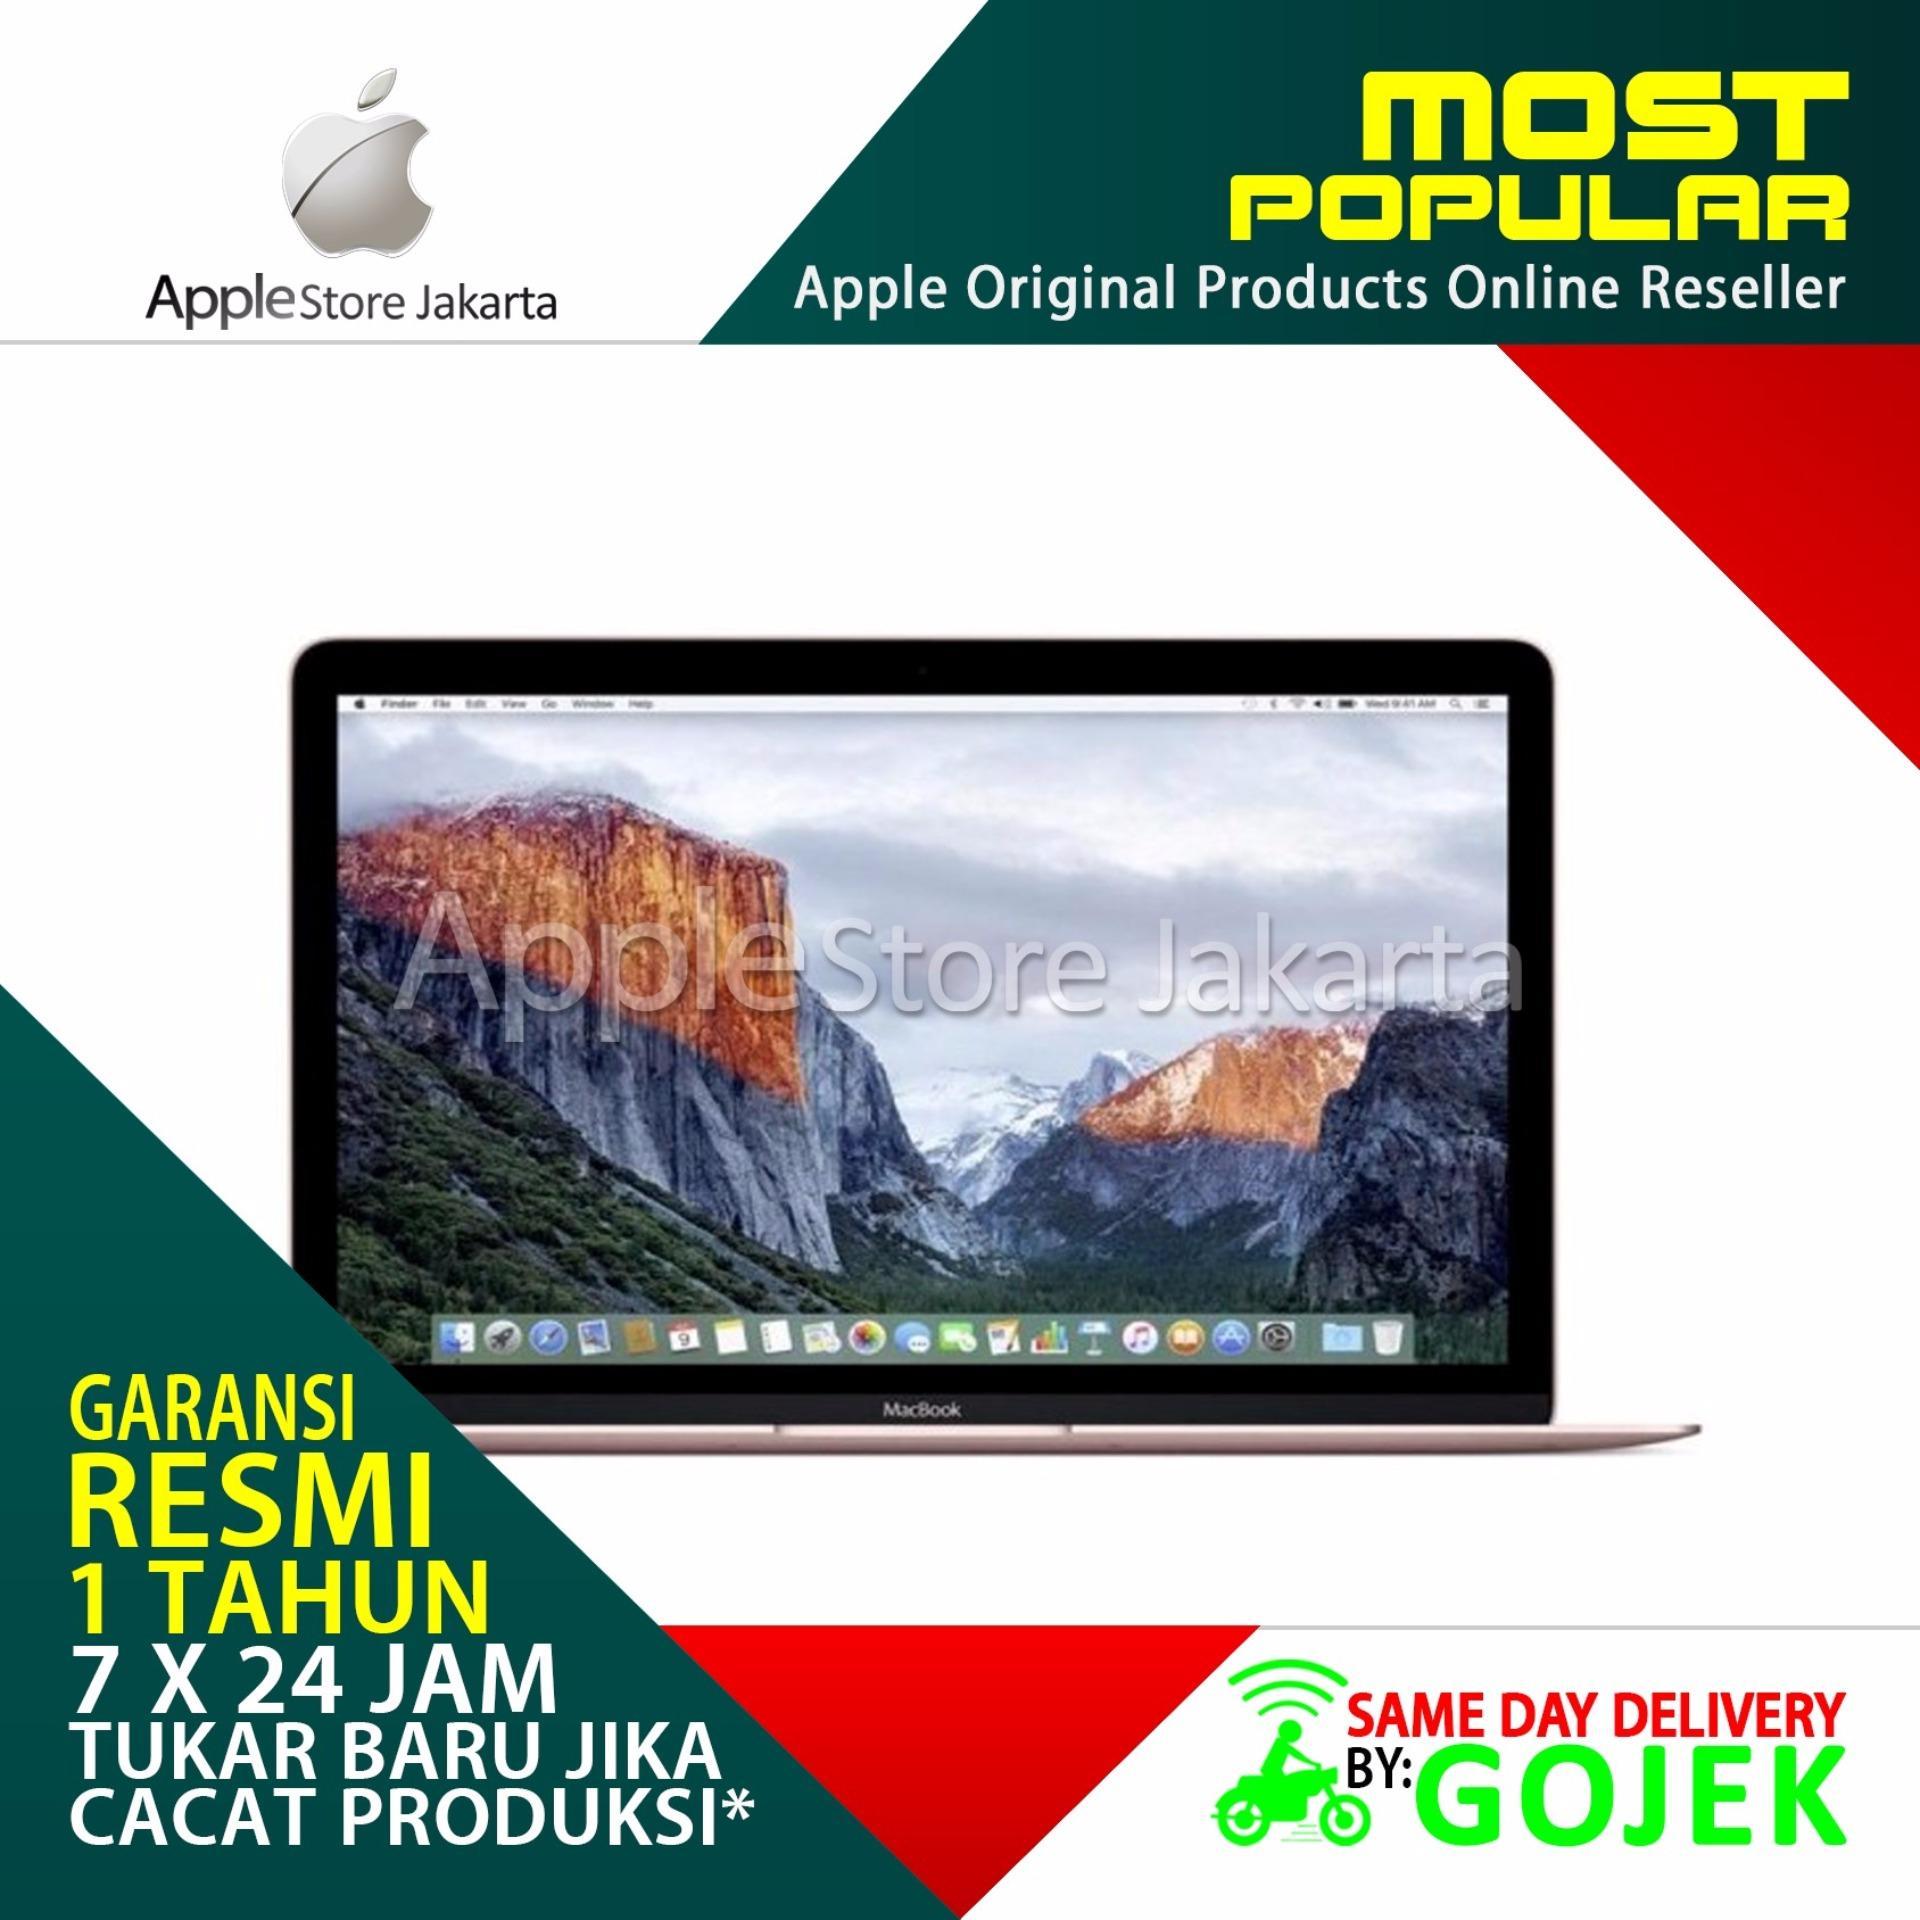 Air Info Harga Berbagai Produk Terbaik Apple Macbook Pro Touch Bar Mlw72 Silver 15inch 26ghz Quad Core I7 16gb 256gb Layar 12 Inch 2017 Mnym2 12ghz Dual M3 8gb Ram